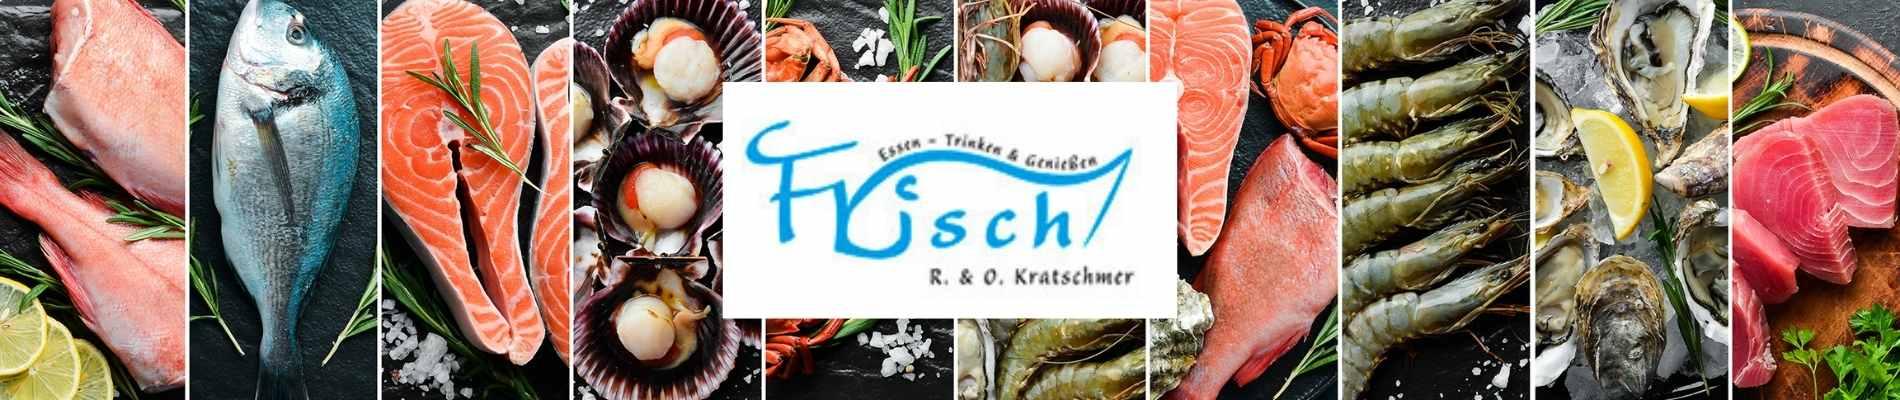 FrischFisch Kratschmer Restaurant Neumarkt Teaser